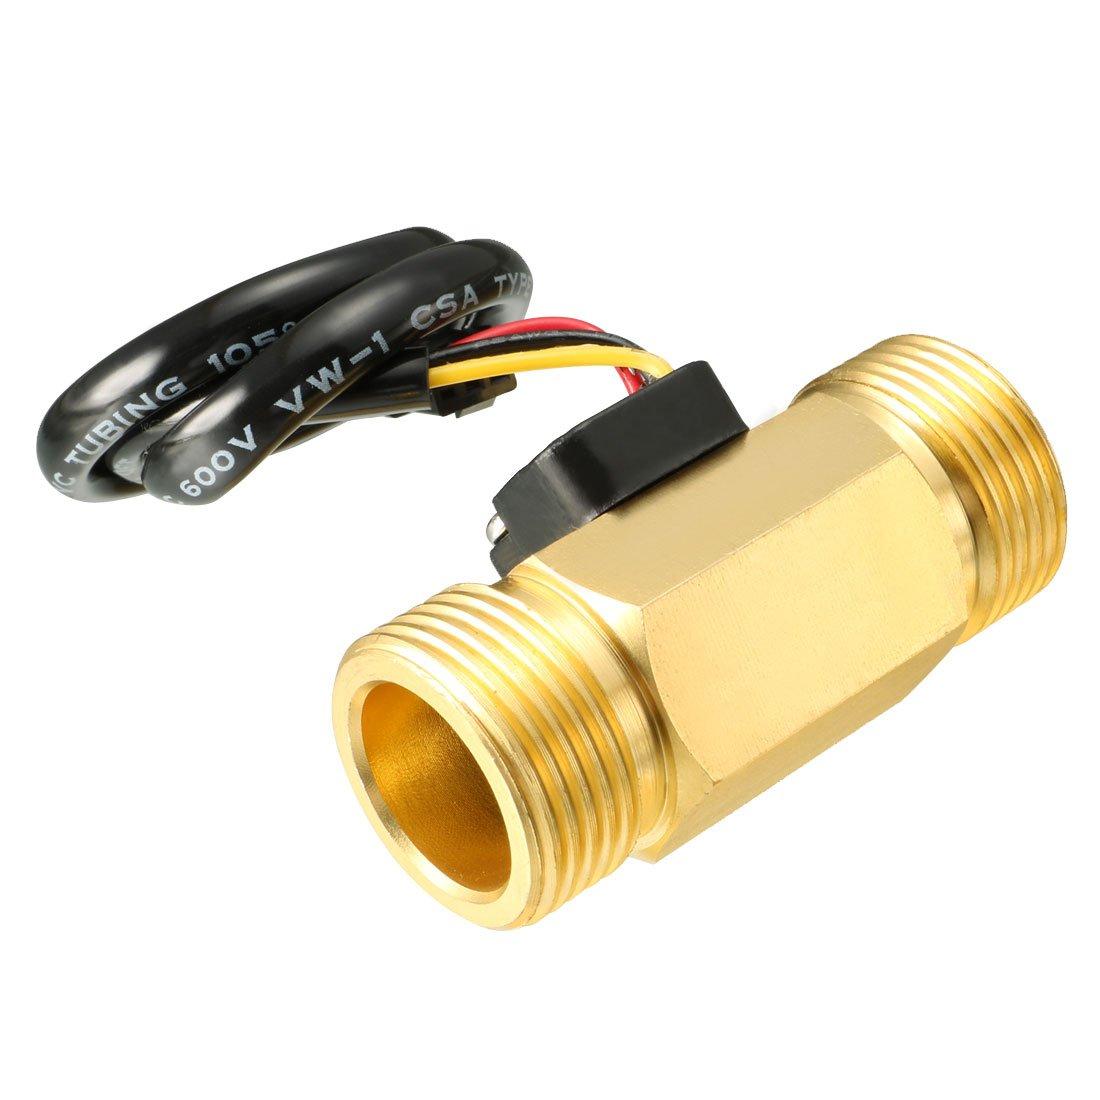 uxcell G3/4'' Hall Effect Liquid Water Flow Sensor Switch Flowmeter Meter DC 5V 2-60L/min SEN-HZ43WB